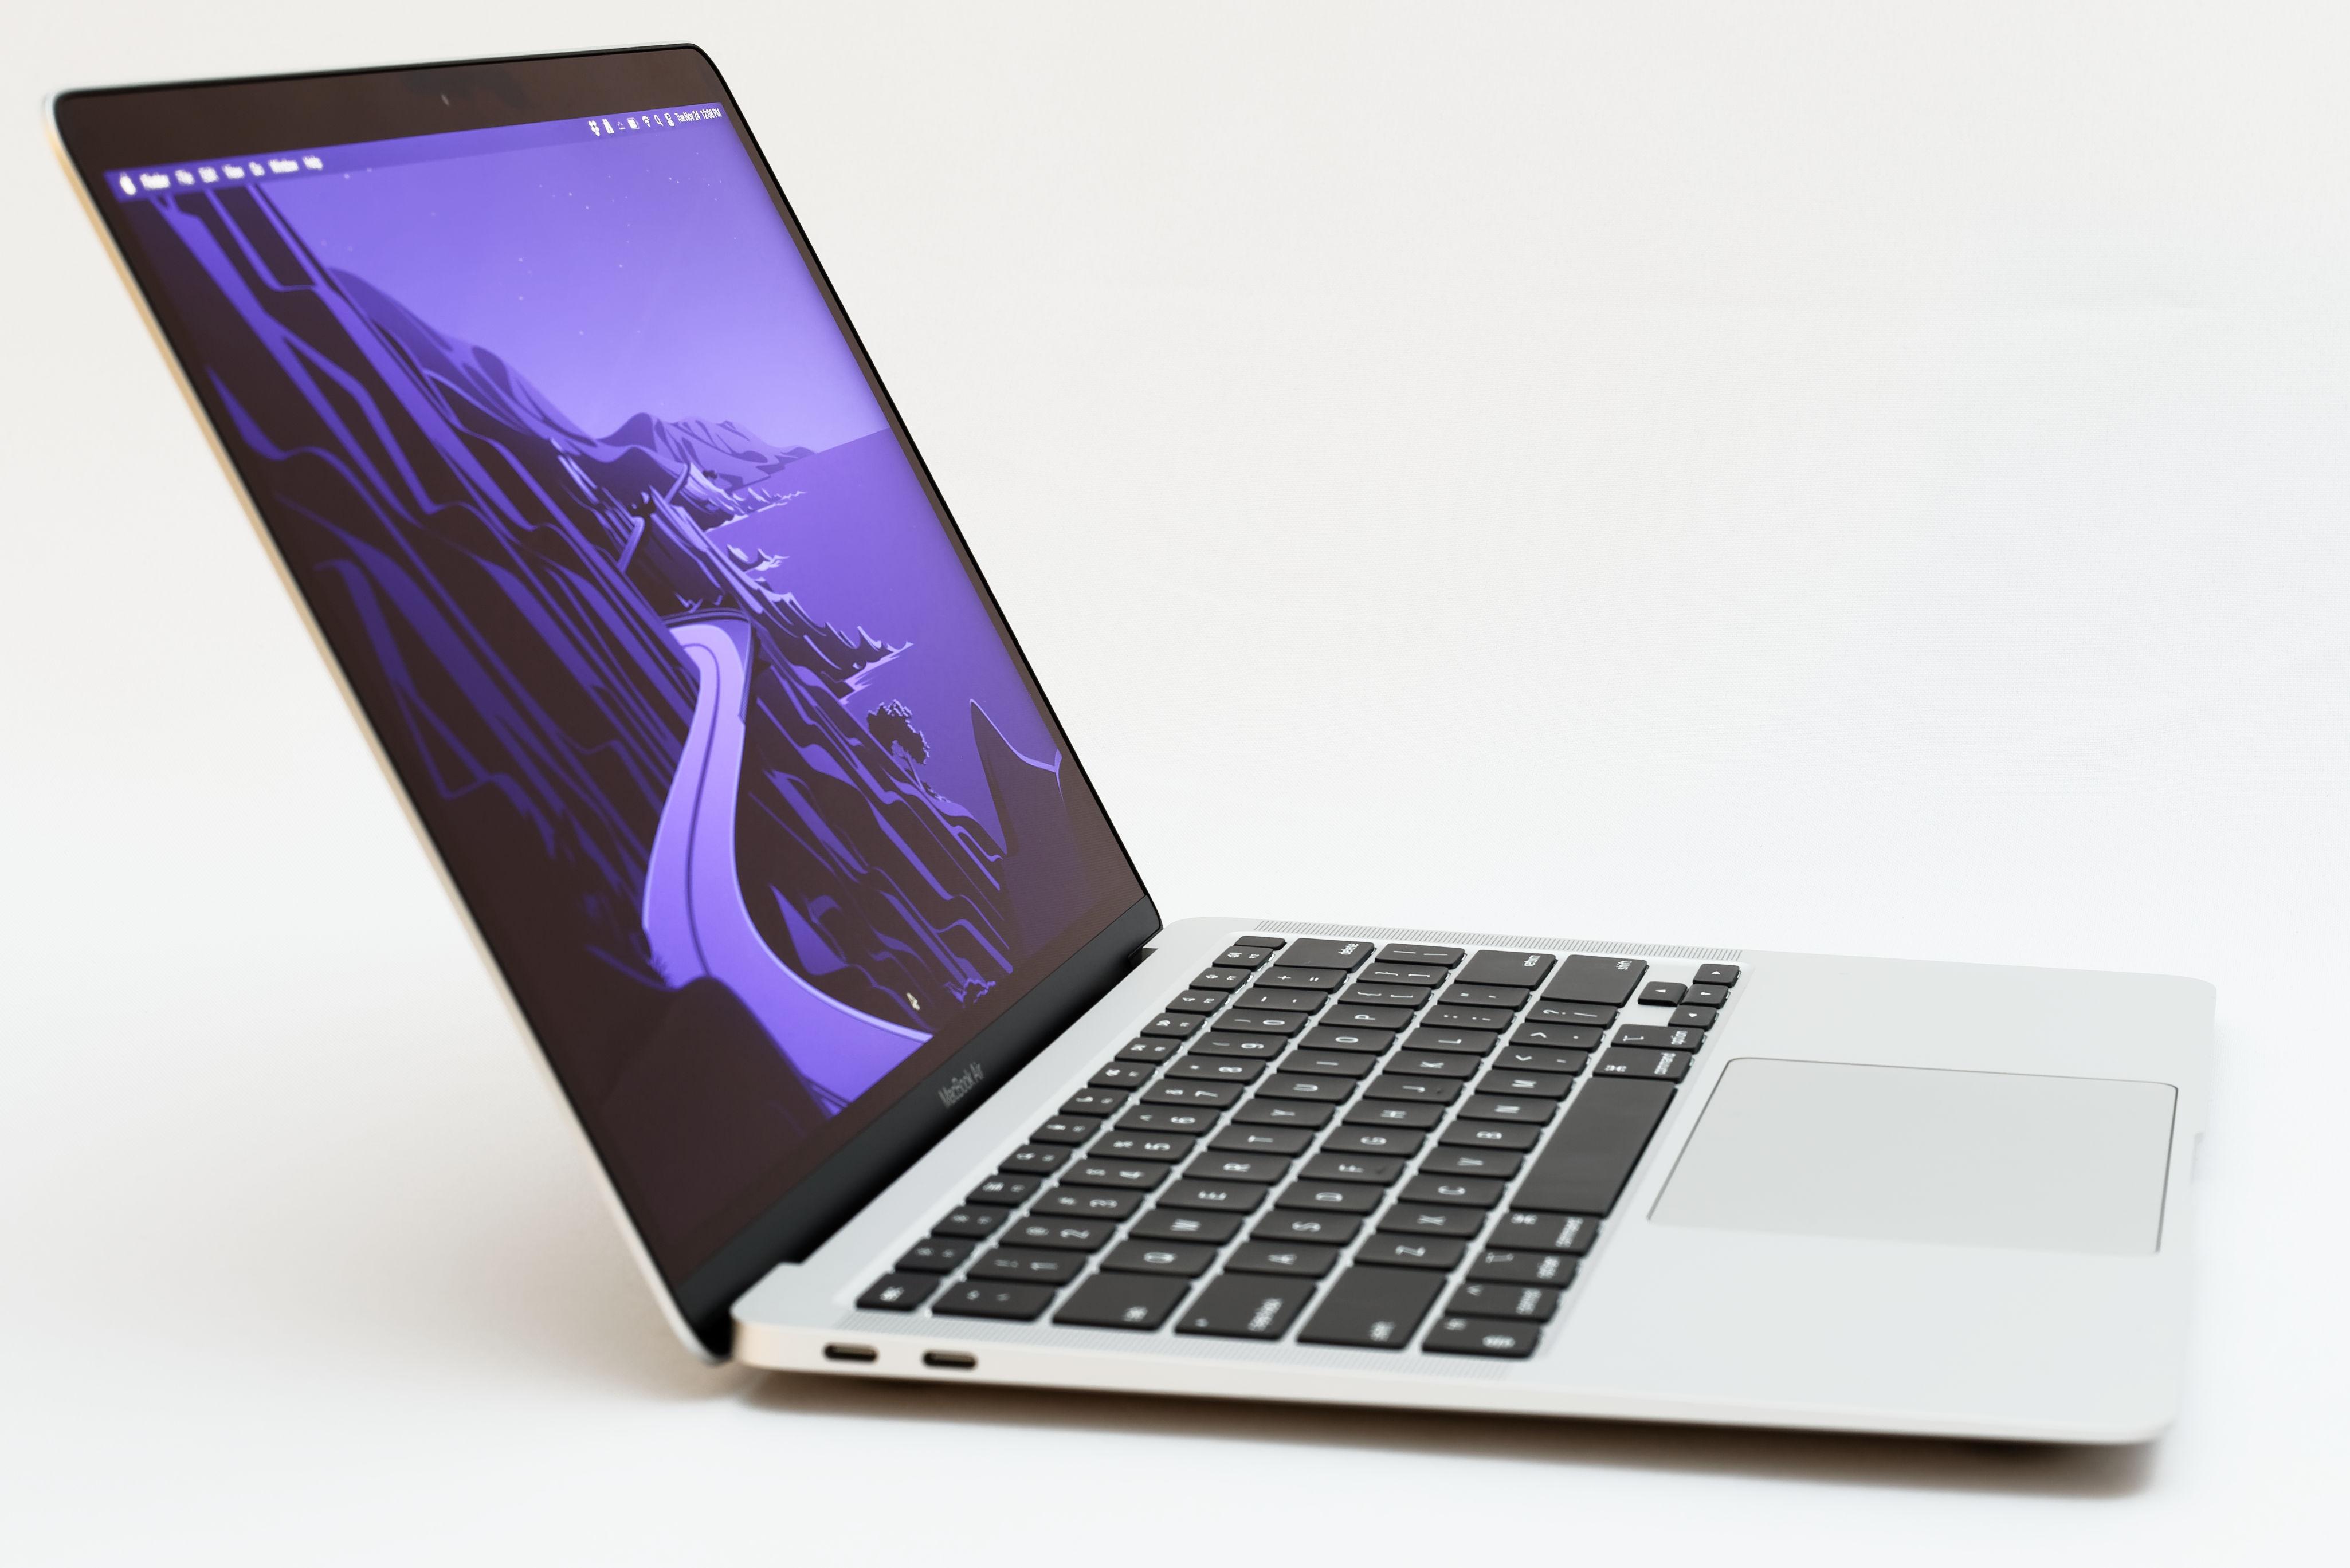 The M1 MacBook Air.